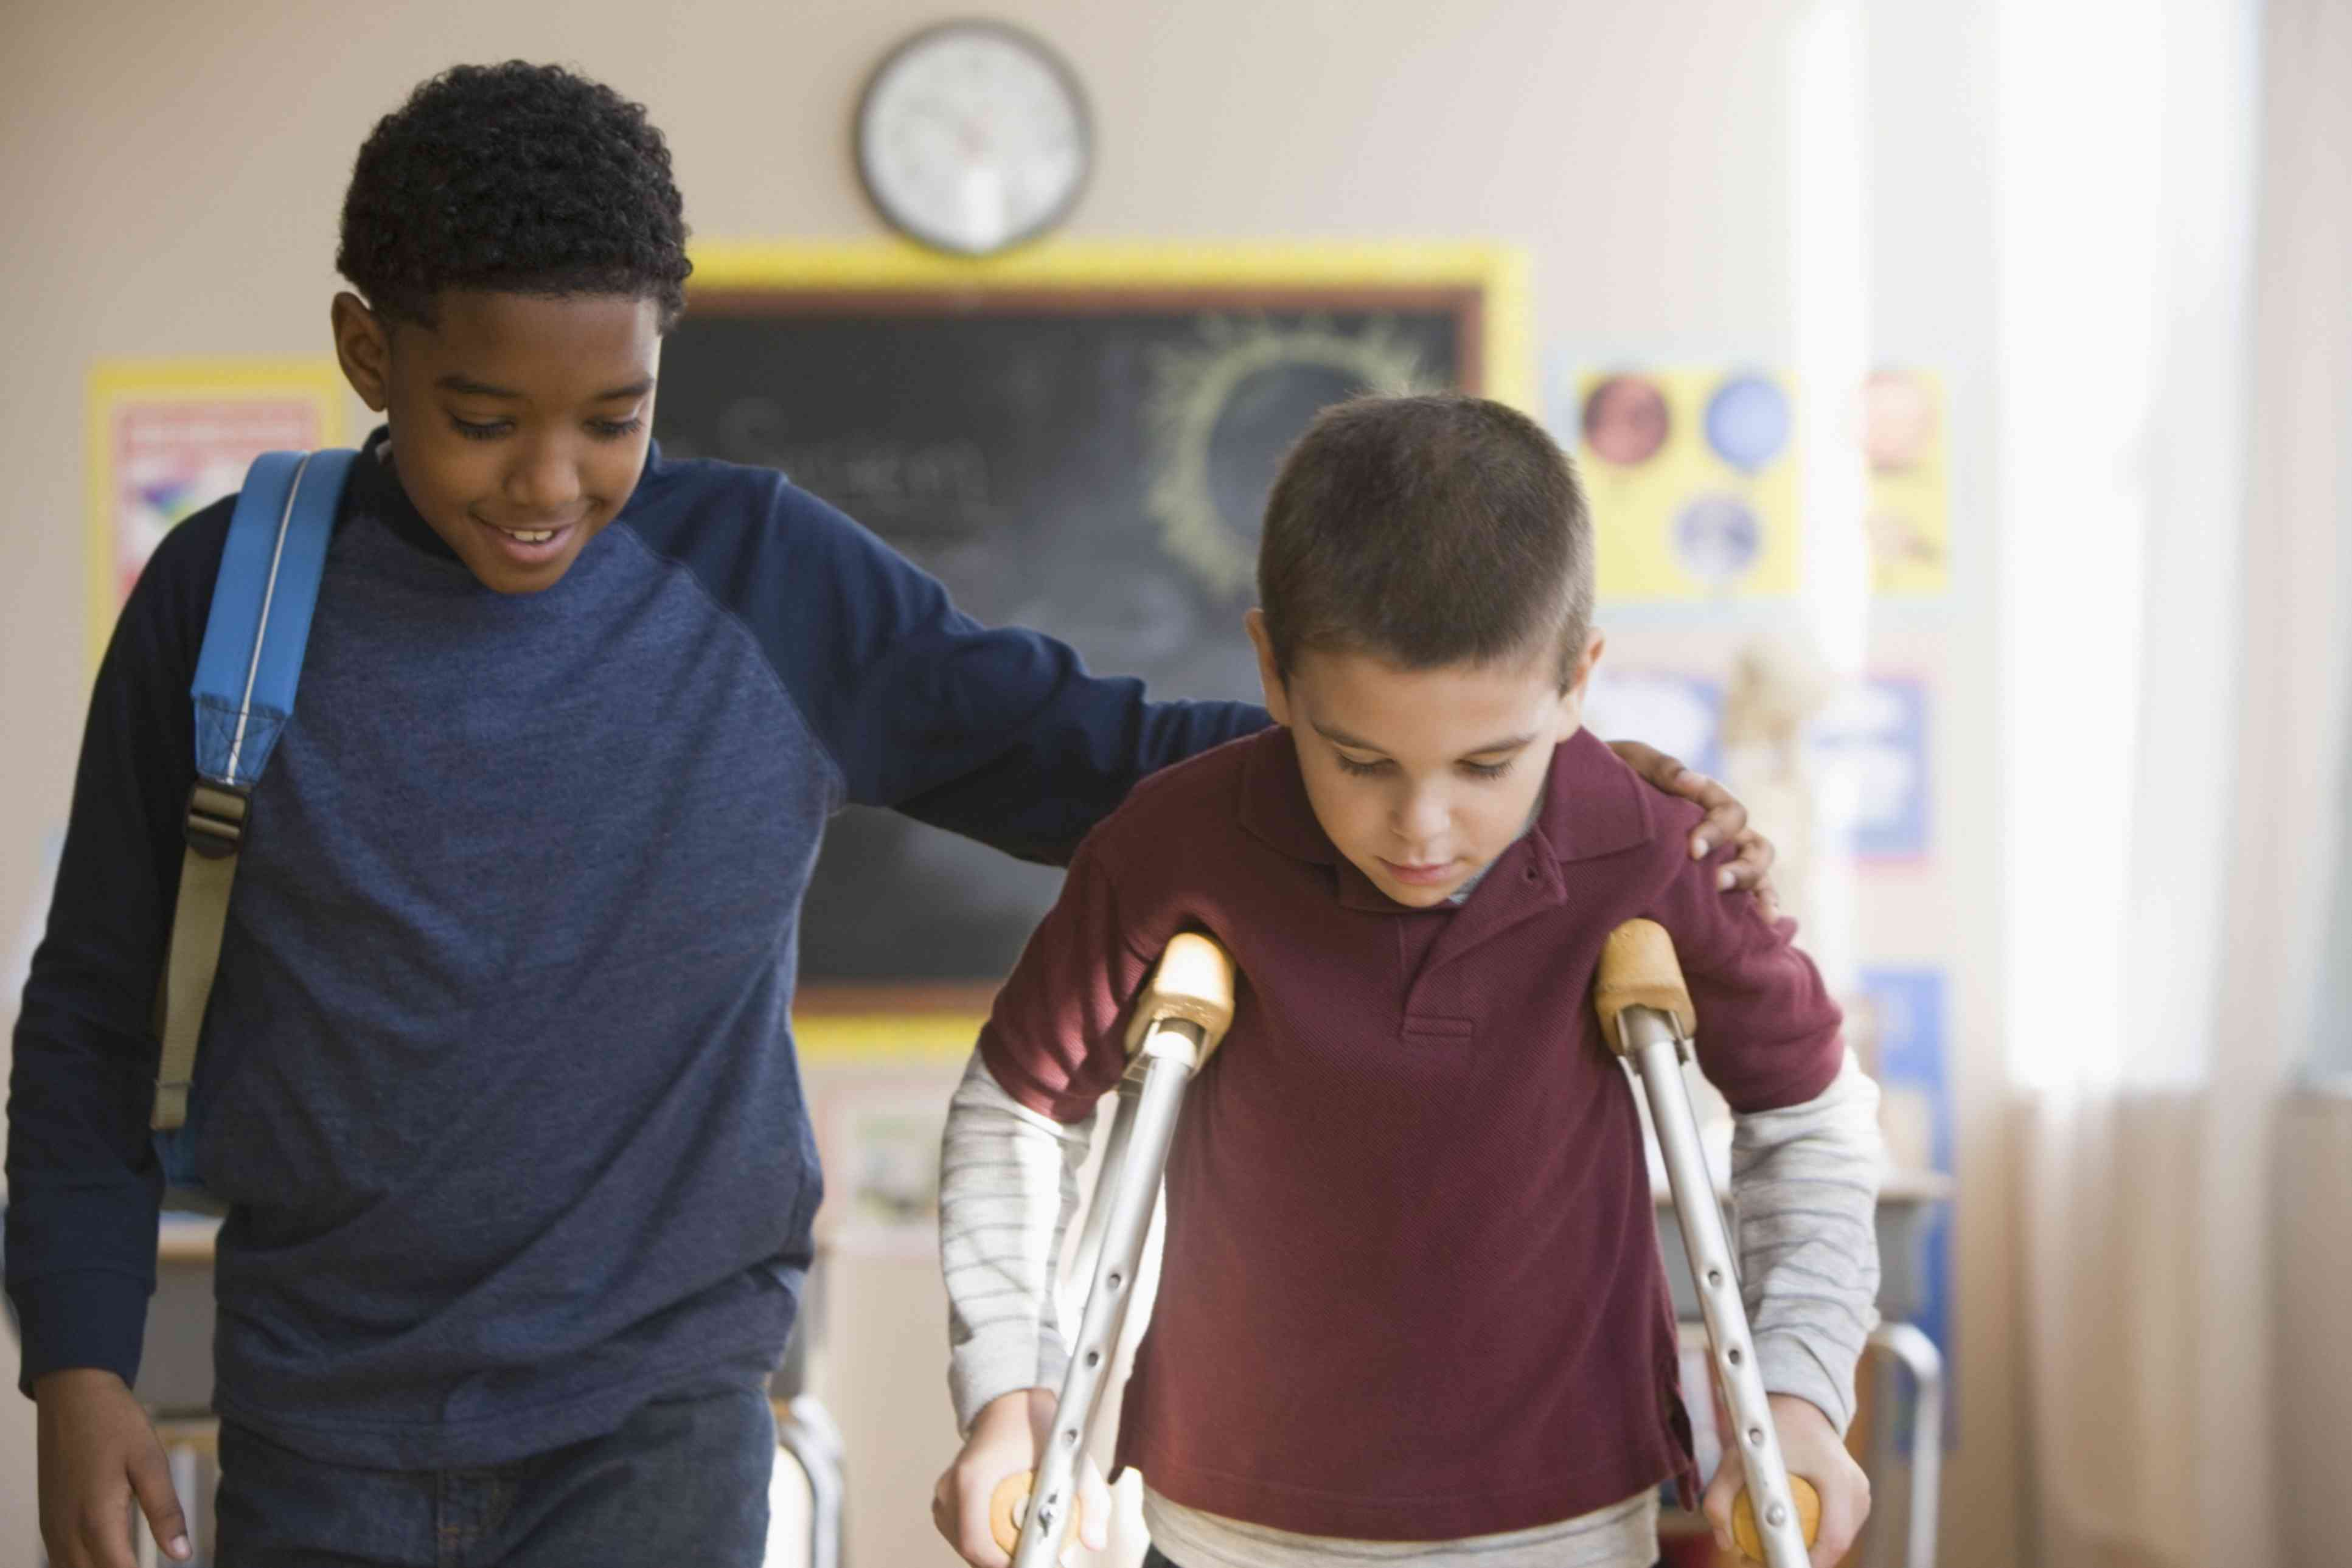 Boy helping friend with crutches